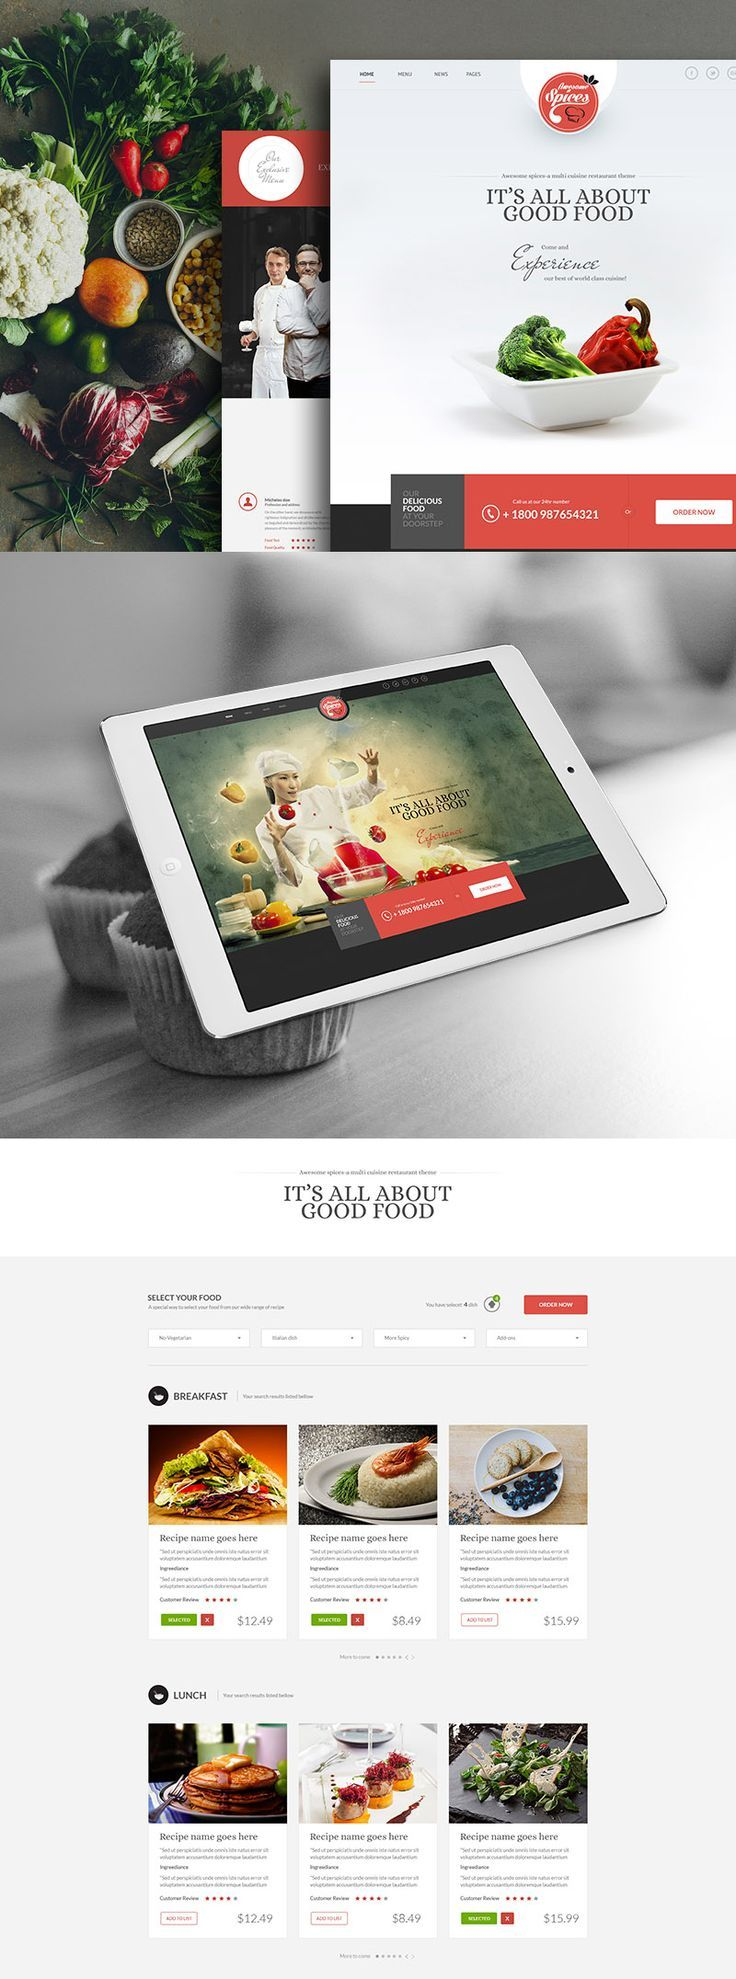 22 best MAC 2.0 Moodboard images on Pinterest | Website designs ...